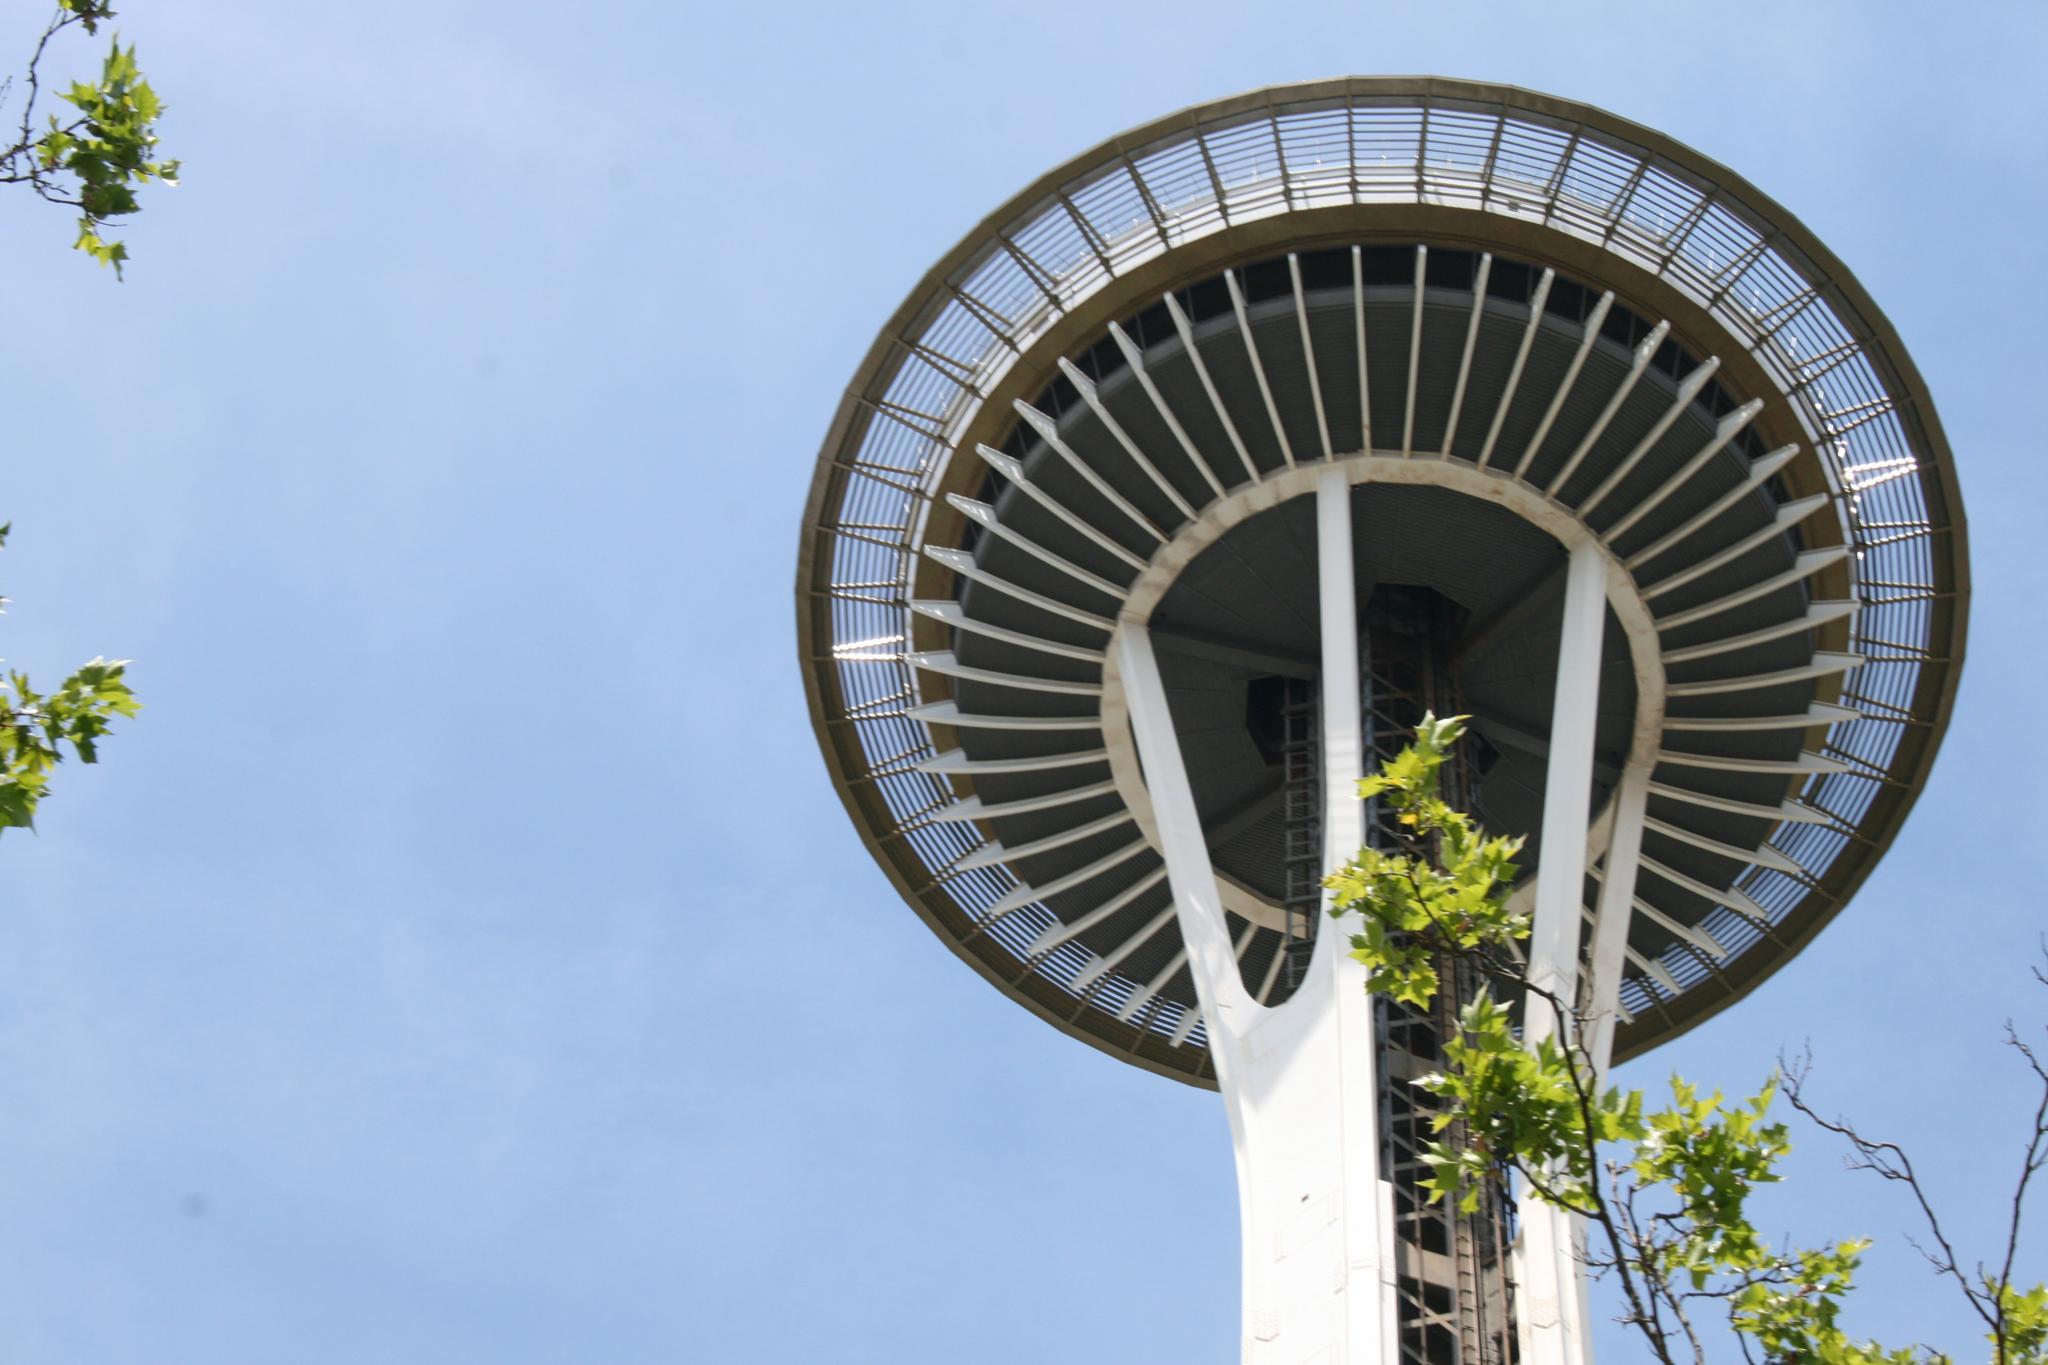 Space Needle, Seattle Washington by Earleyone